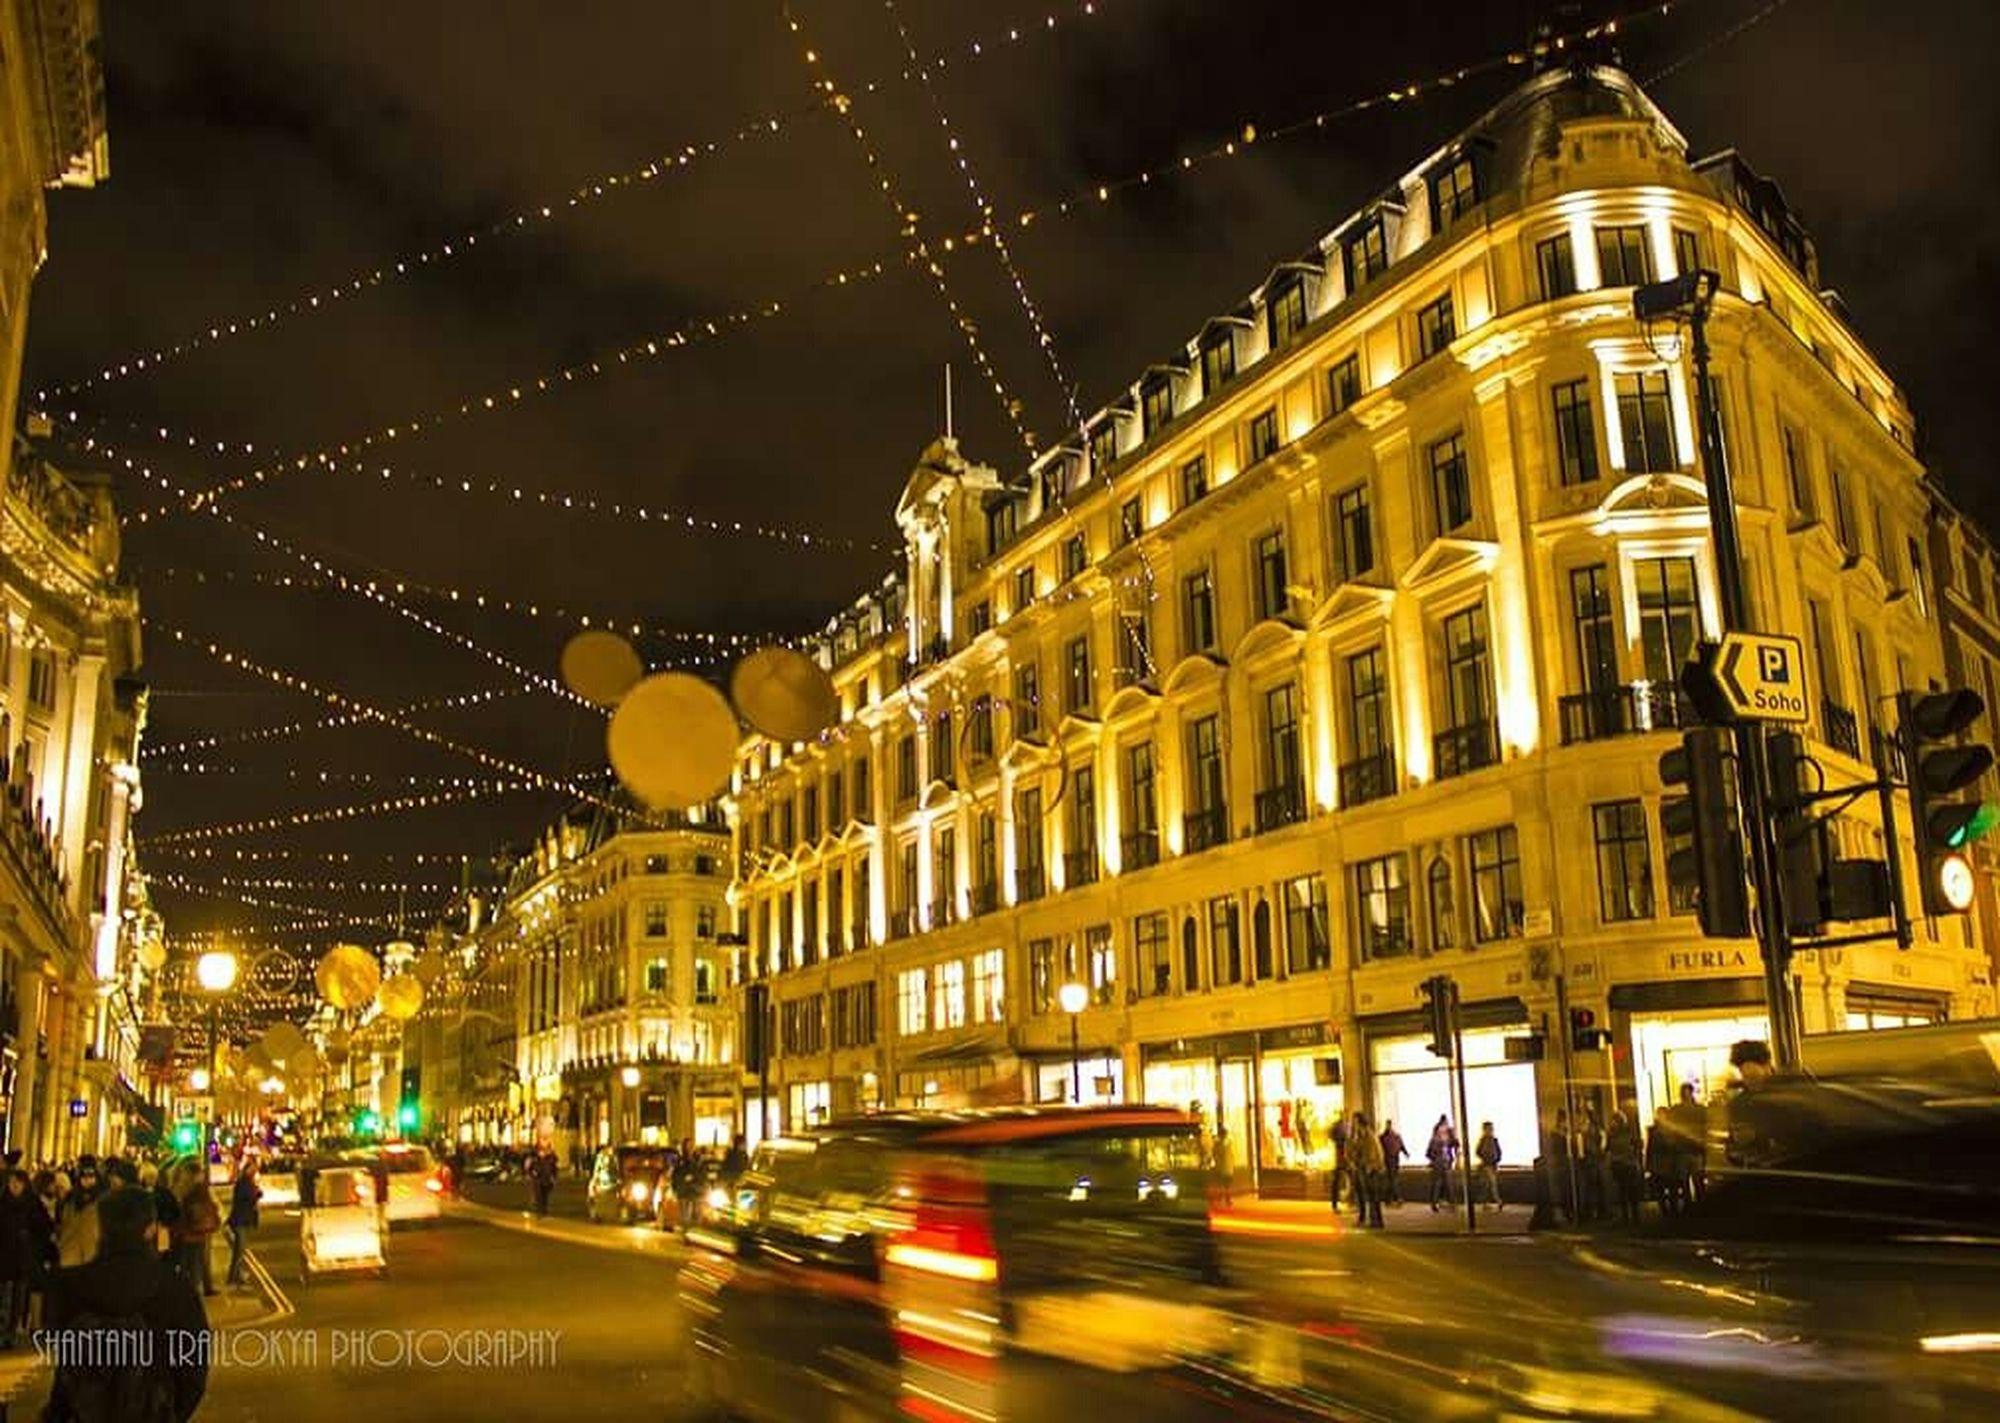 Oxfordstreet Nightphotography PreChristmas Festive Season Shopping Spree